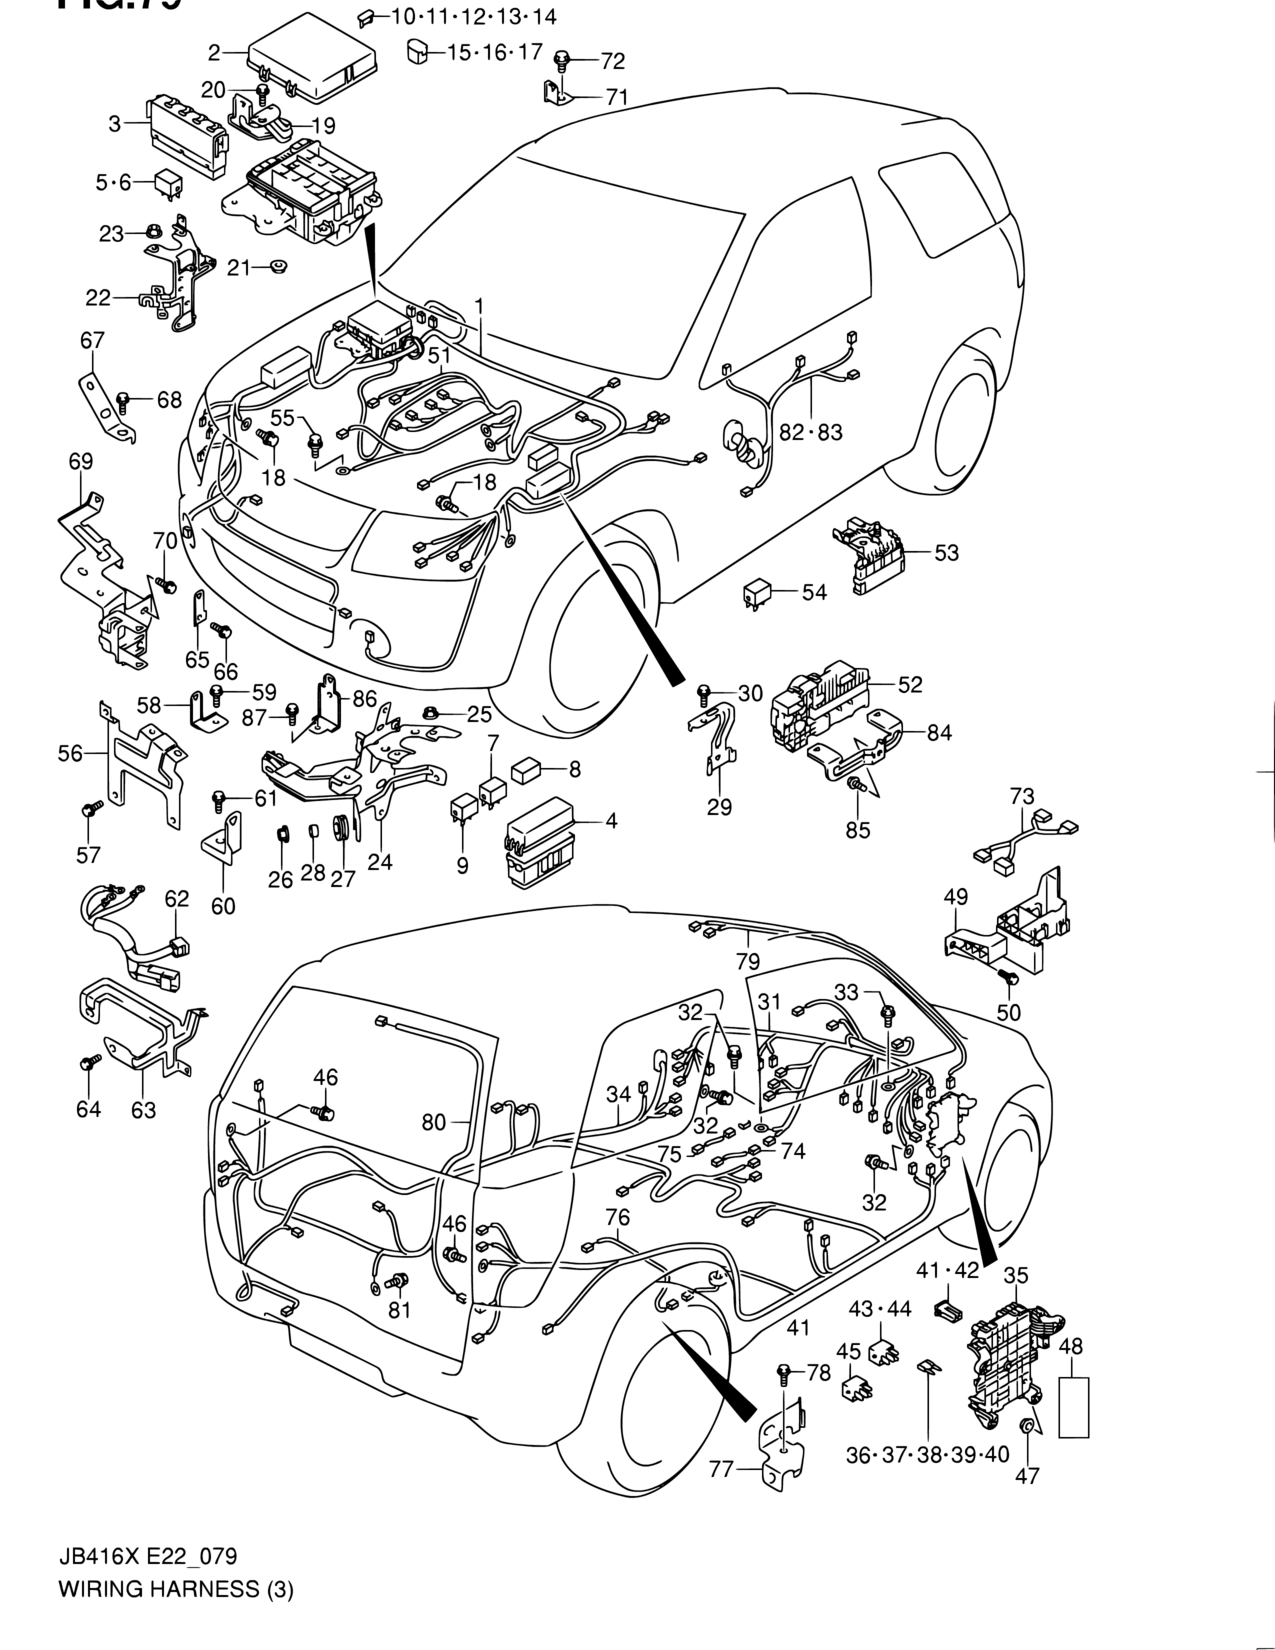 Asia Grand Vitara Jb419xd Electrical 79 Wiring Harness Suzuki Parts